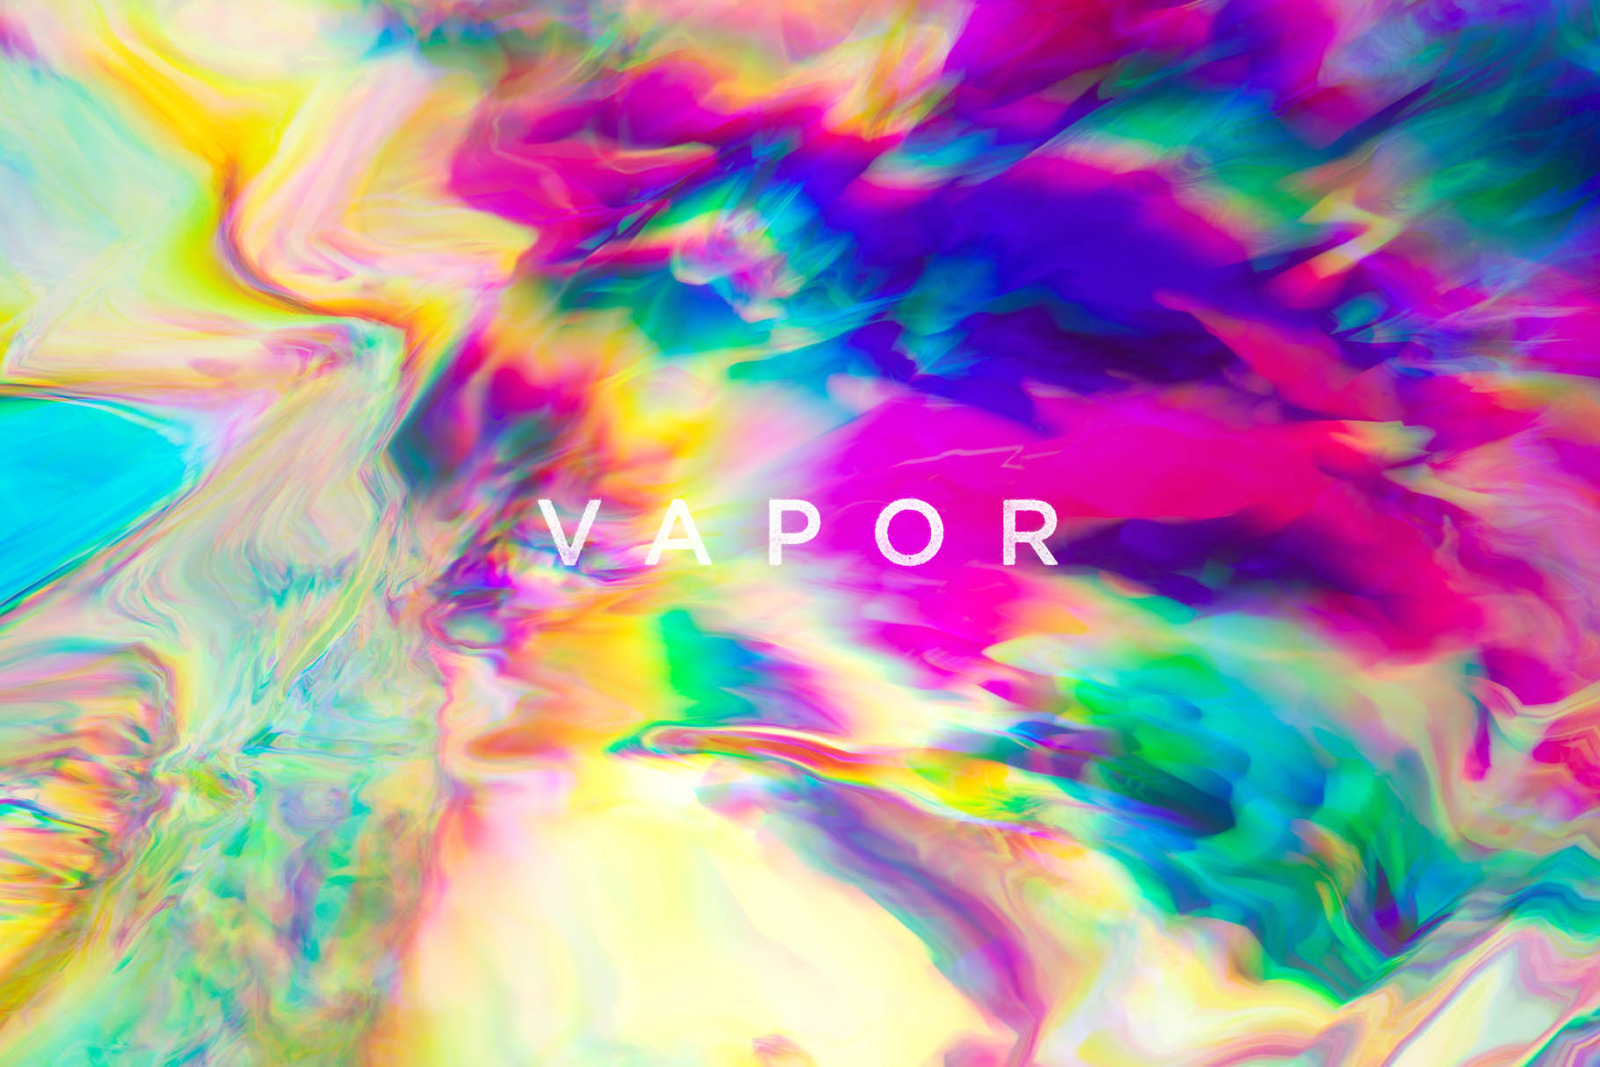 Vapor: Atmospheric Distortions